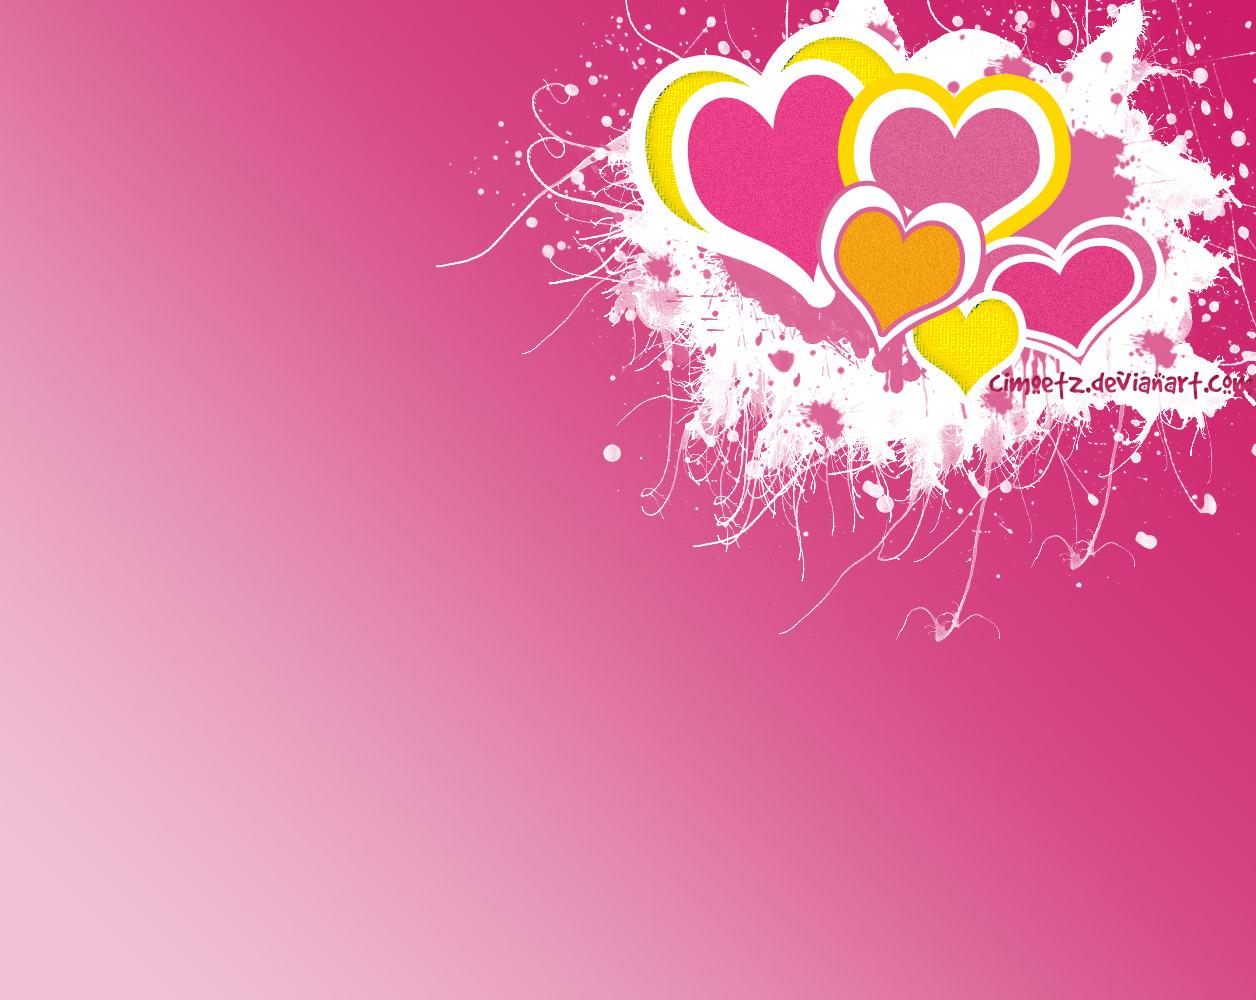 Fondos De Pantalla Gratis San Valentin 16: Fondos De Amor Y San Valentin, Wallpapers Gratis